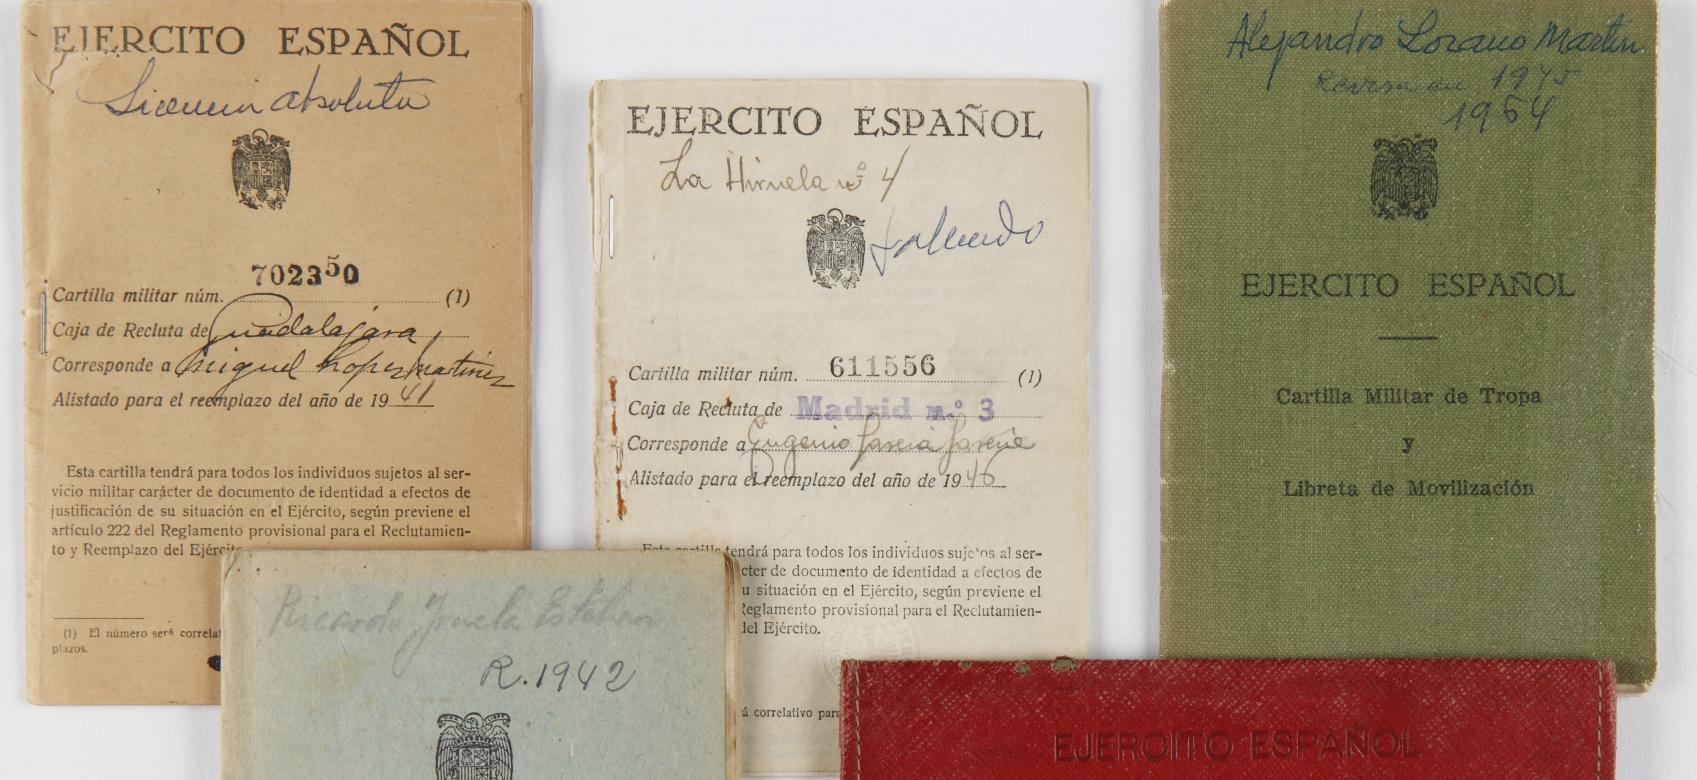 Buscador de documentos